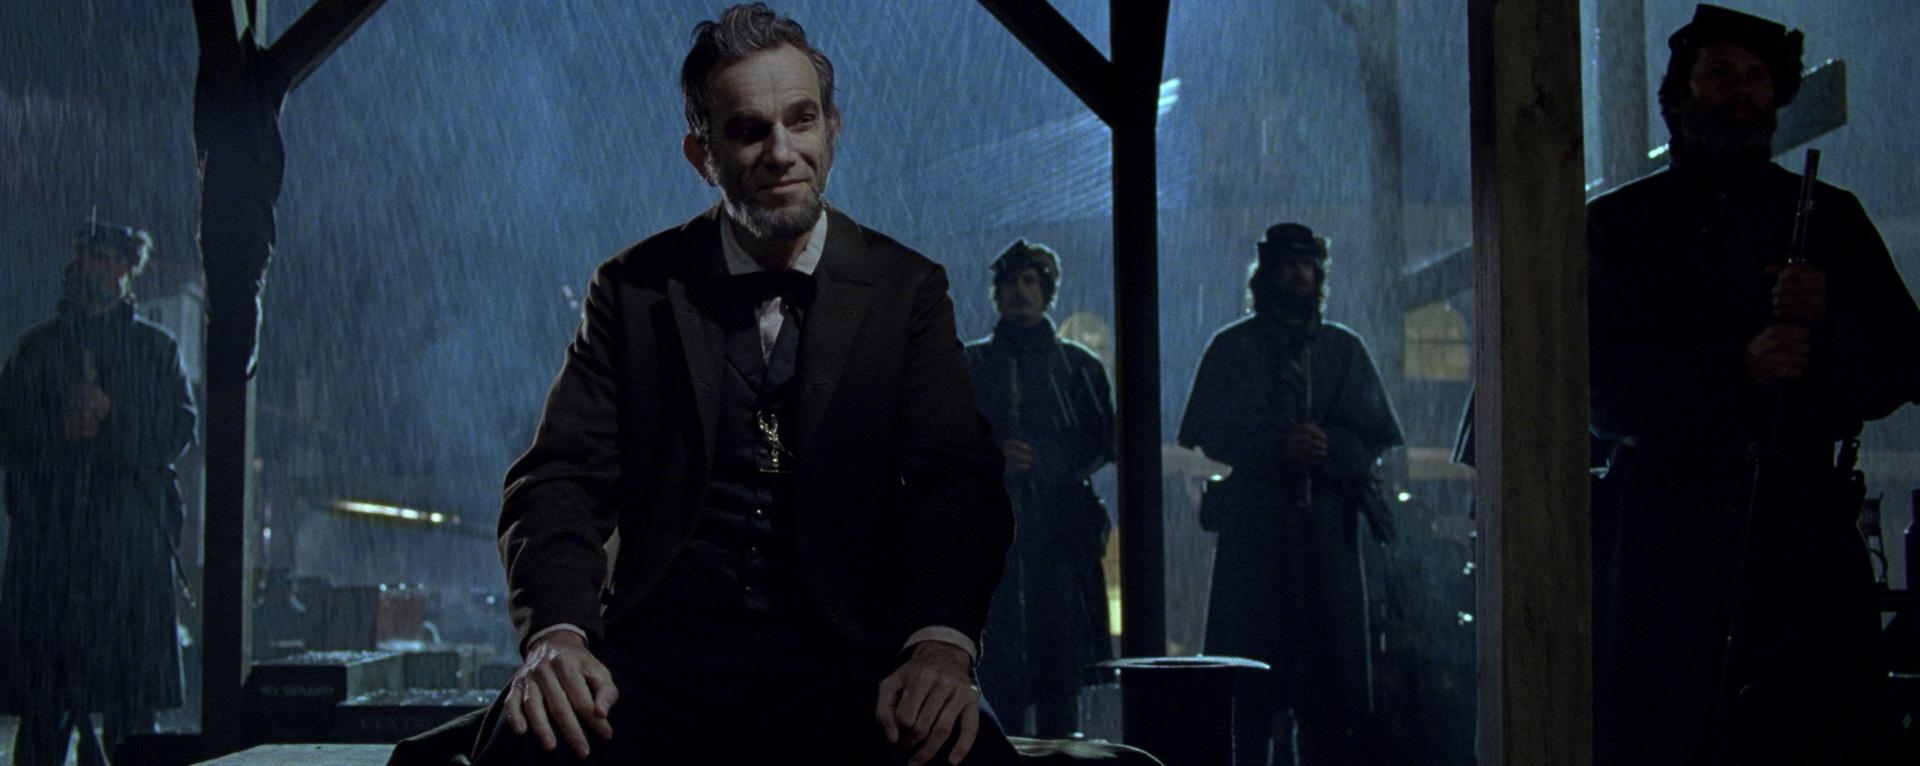 https://i0.wp.com/www.filmofilia.com/wp-content/uploads/2012/09/Lincoln-Daniel-Day-Lewis2.jpg